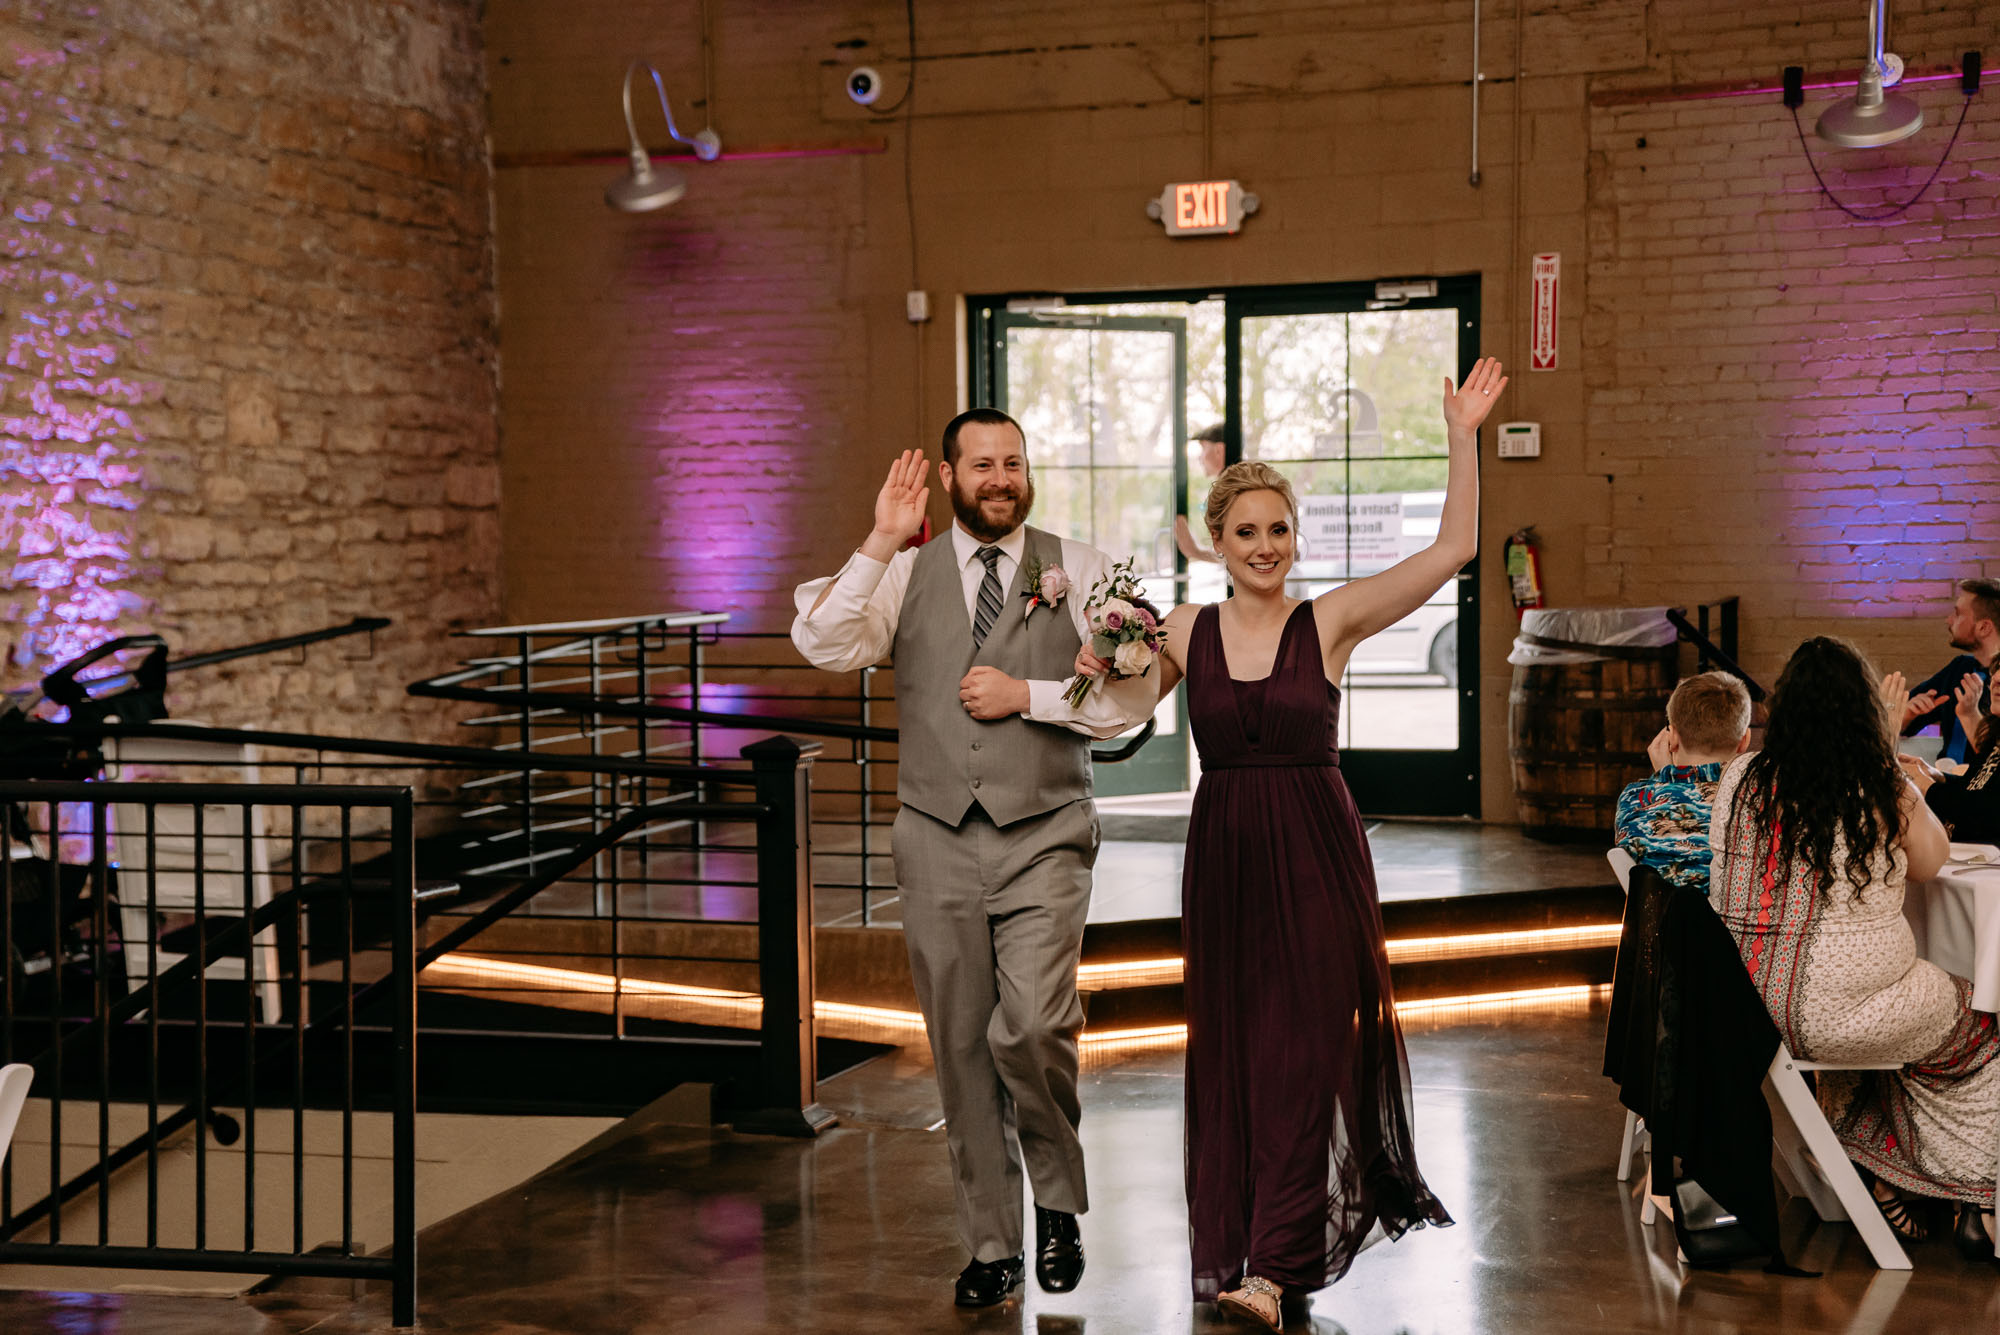 prairie-street-brewhouse-wedding-Rockford-IL-wedding-photographers-237.jpg